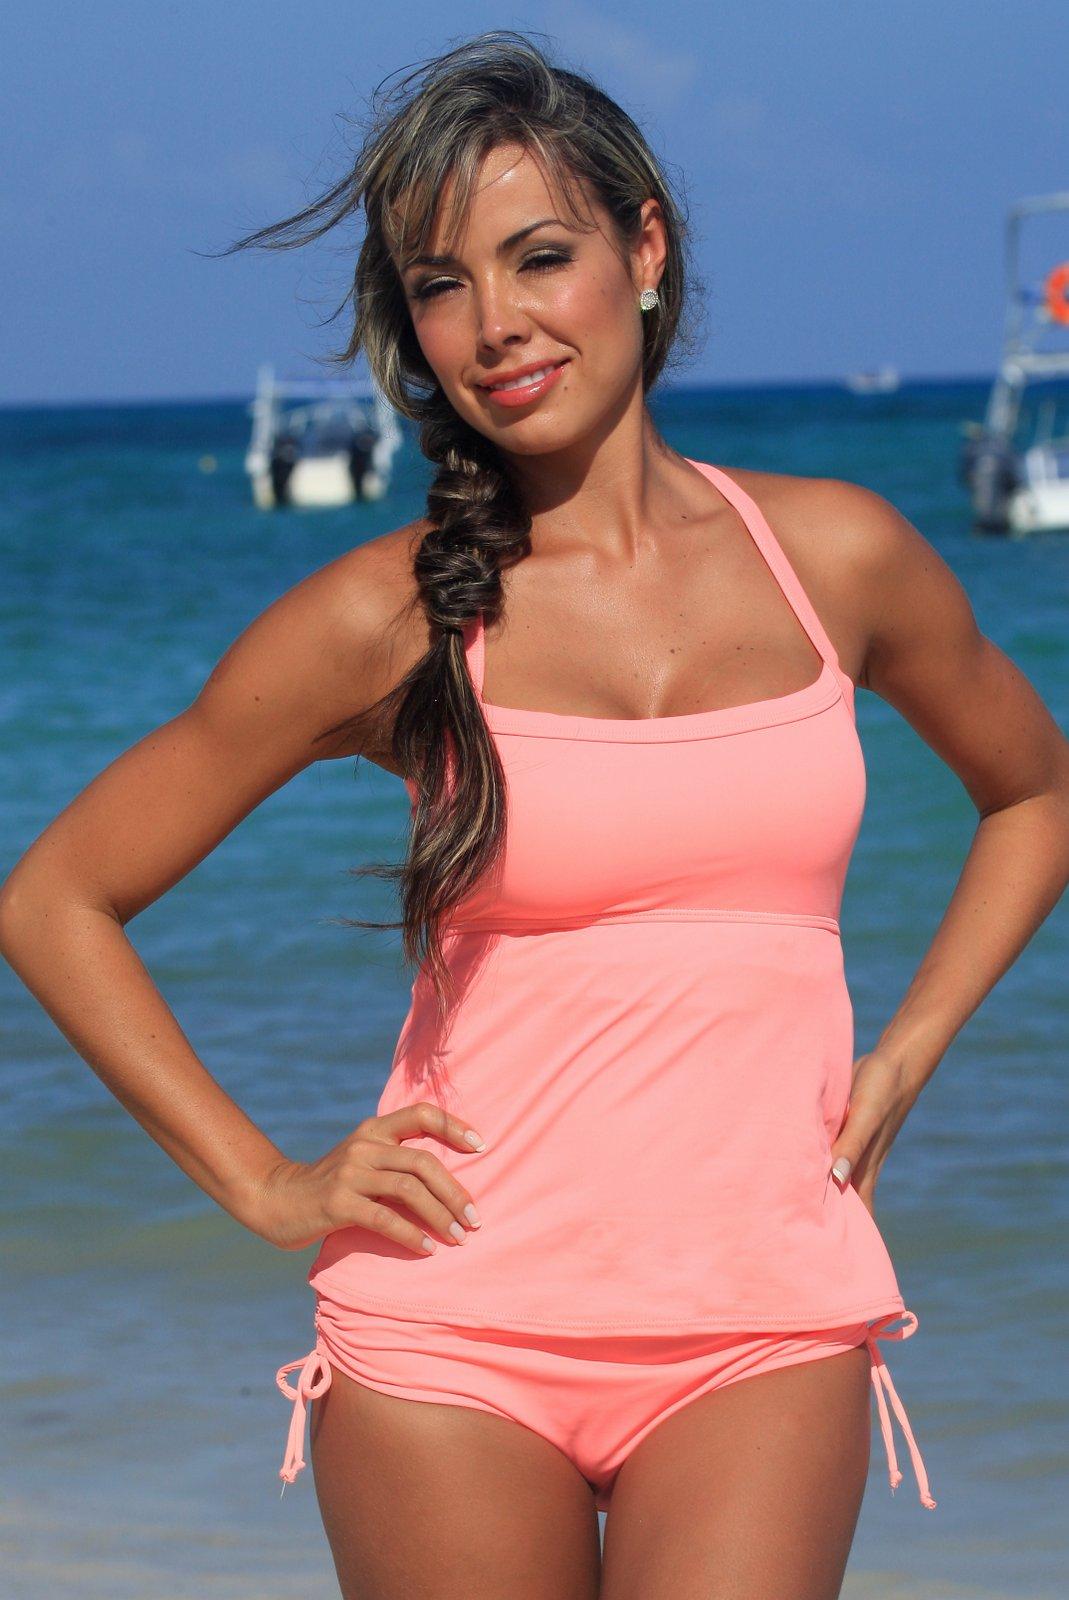 32aaf3f9cb5 CORAL FULL FIGURE TANKINI PLUS | Fiji Swimwear – Quality Swimwear at ...